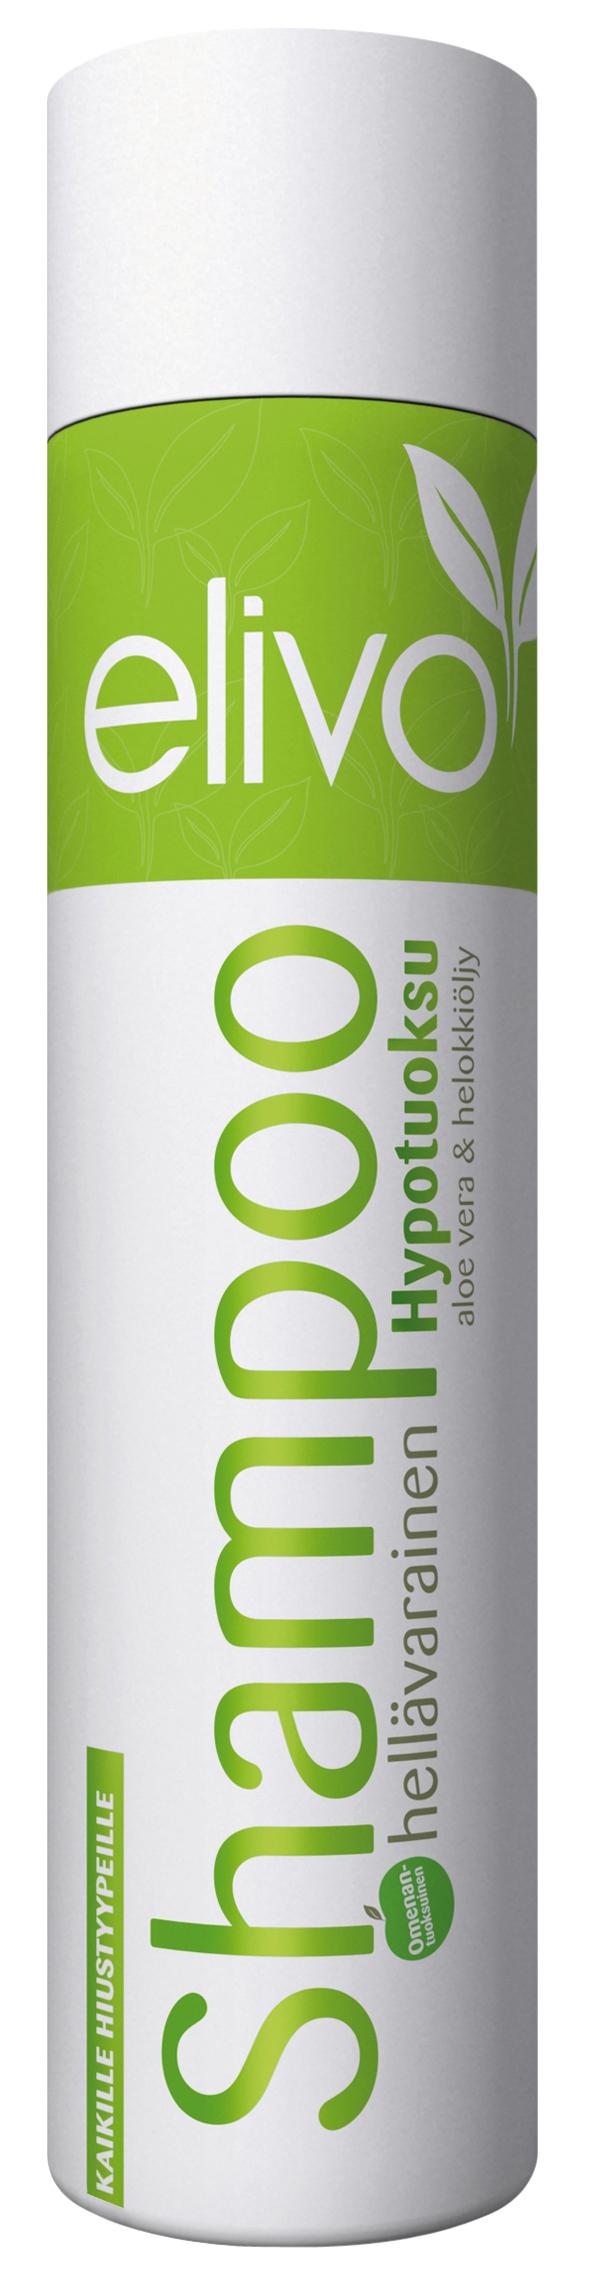 elivo-shampoo